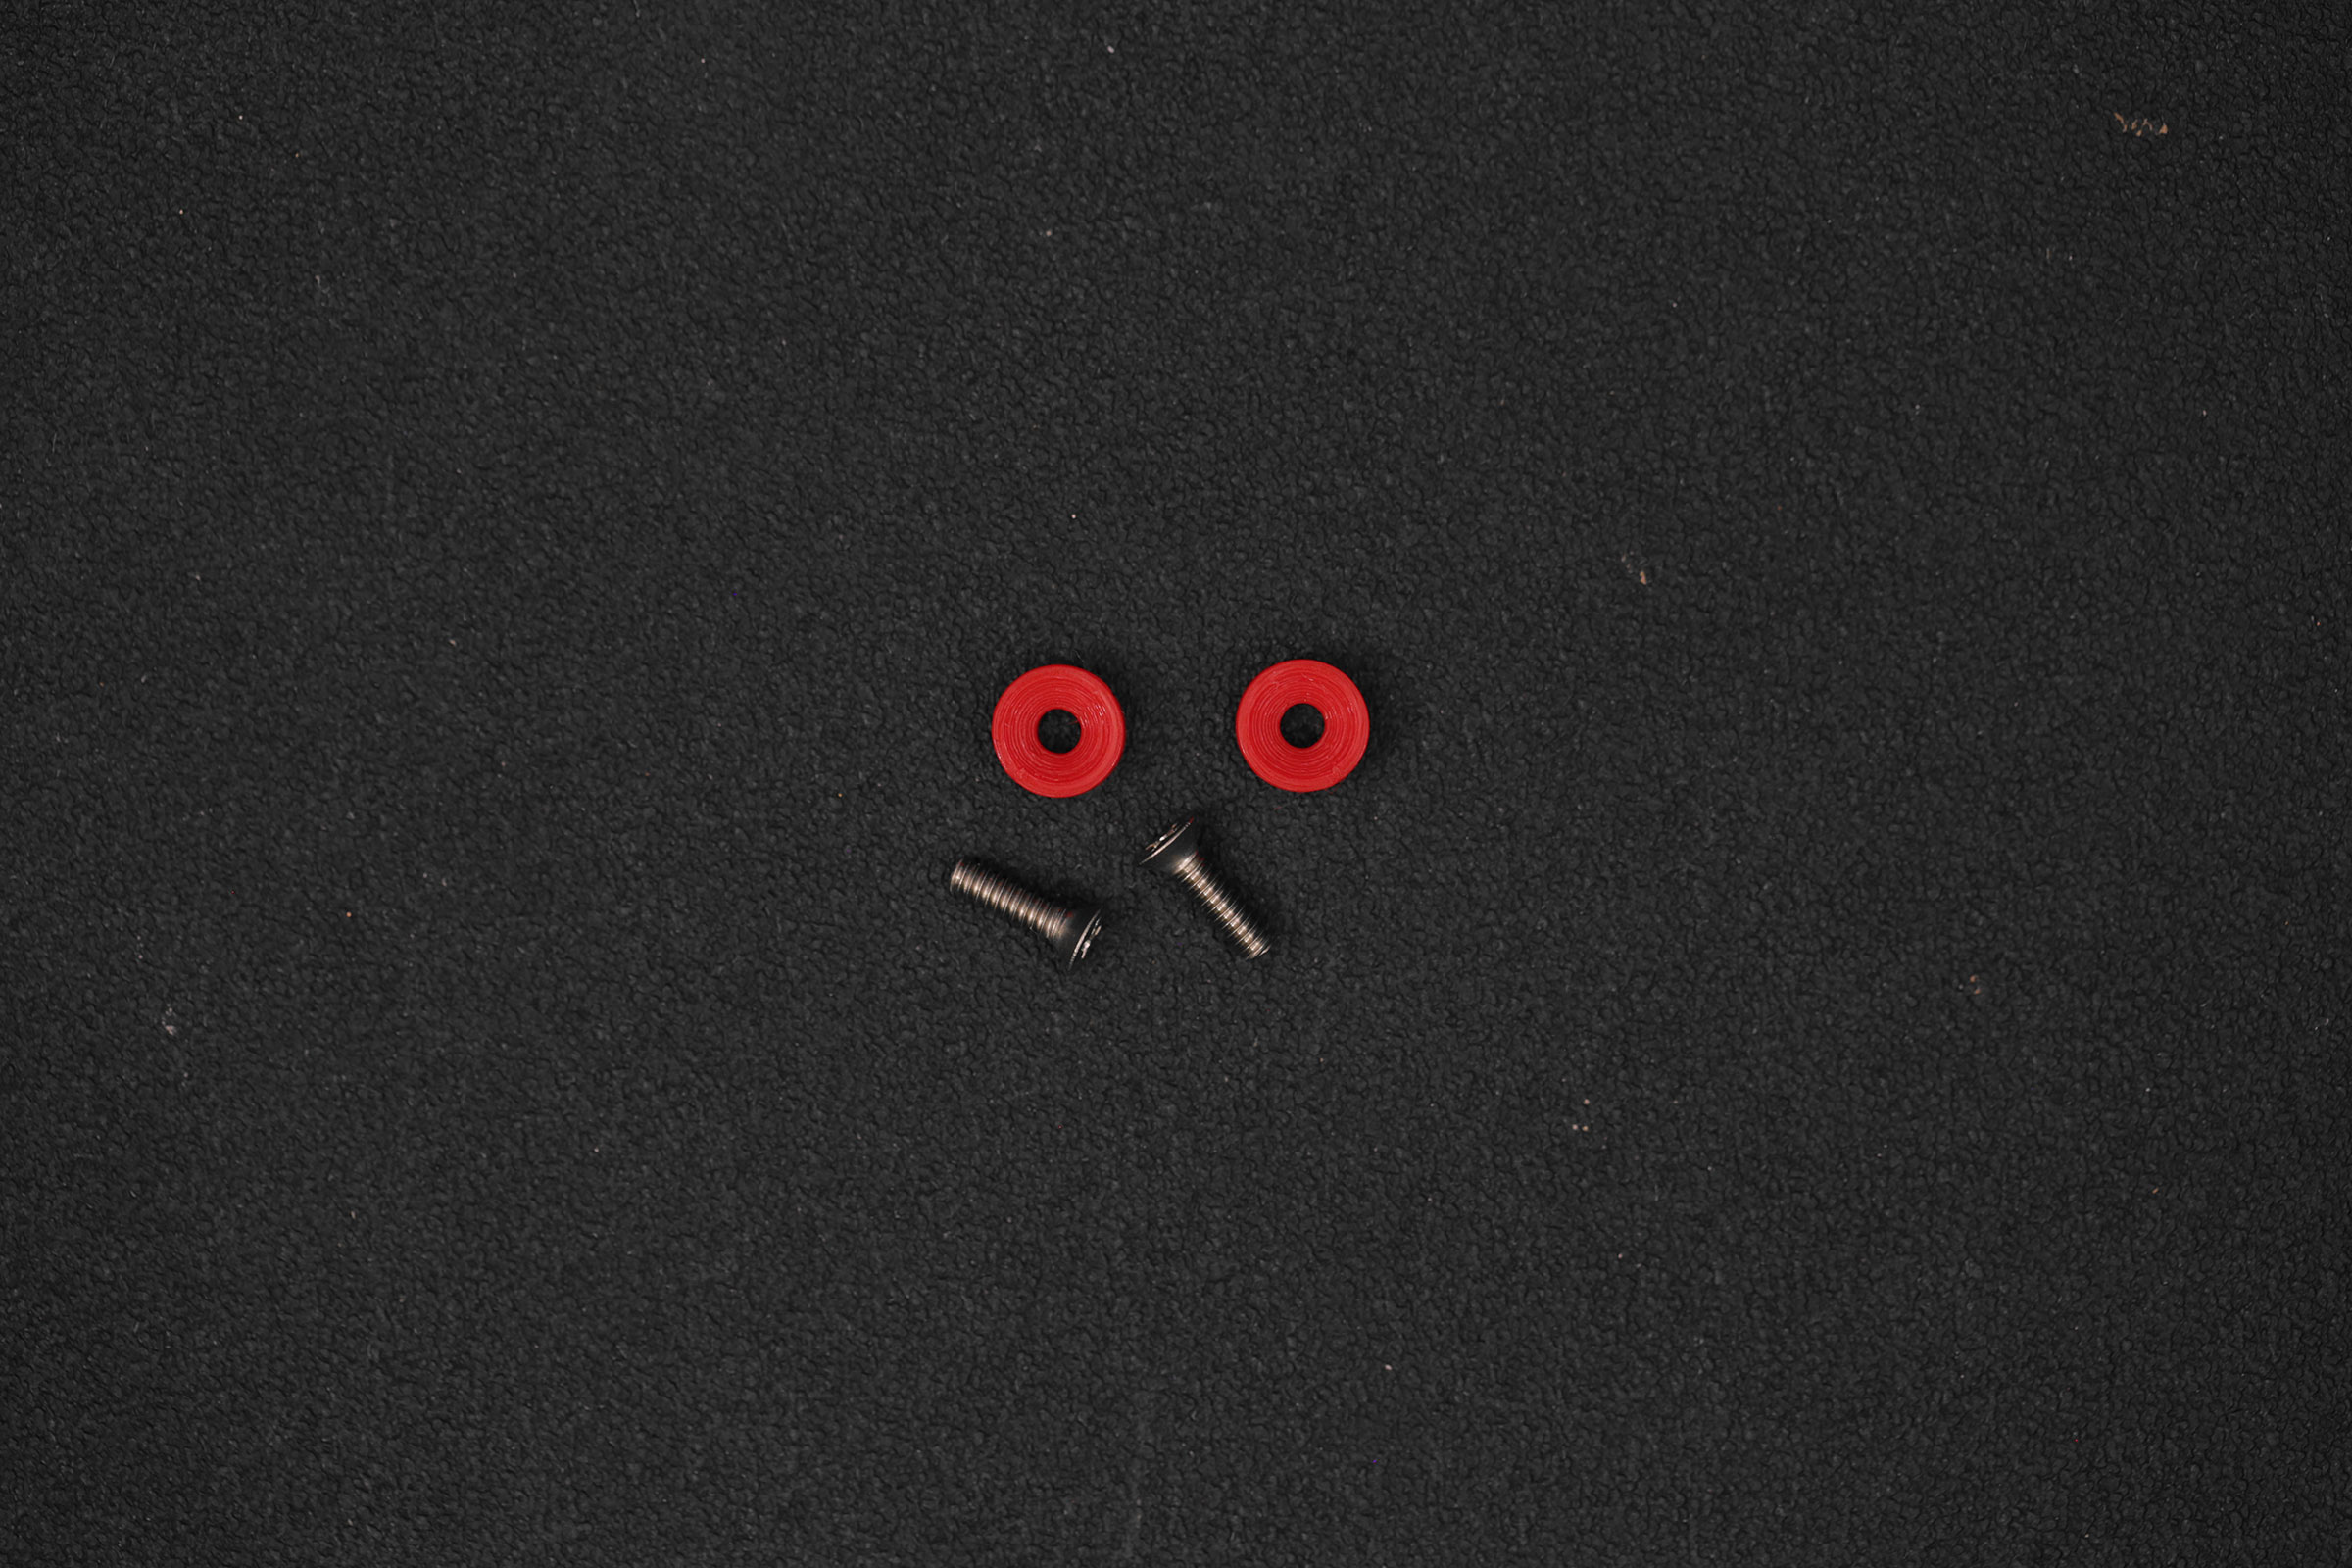 raspberry_pi_washers-screws.jpg